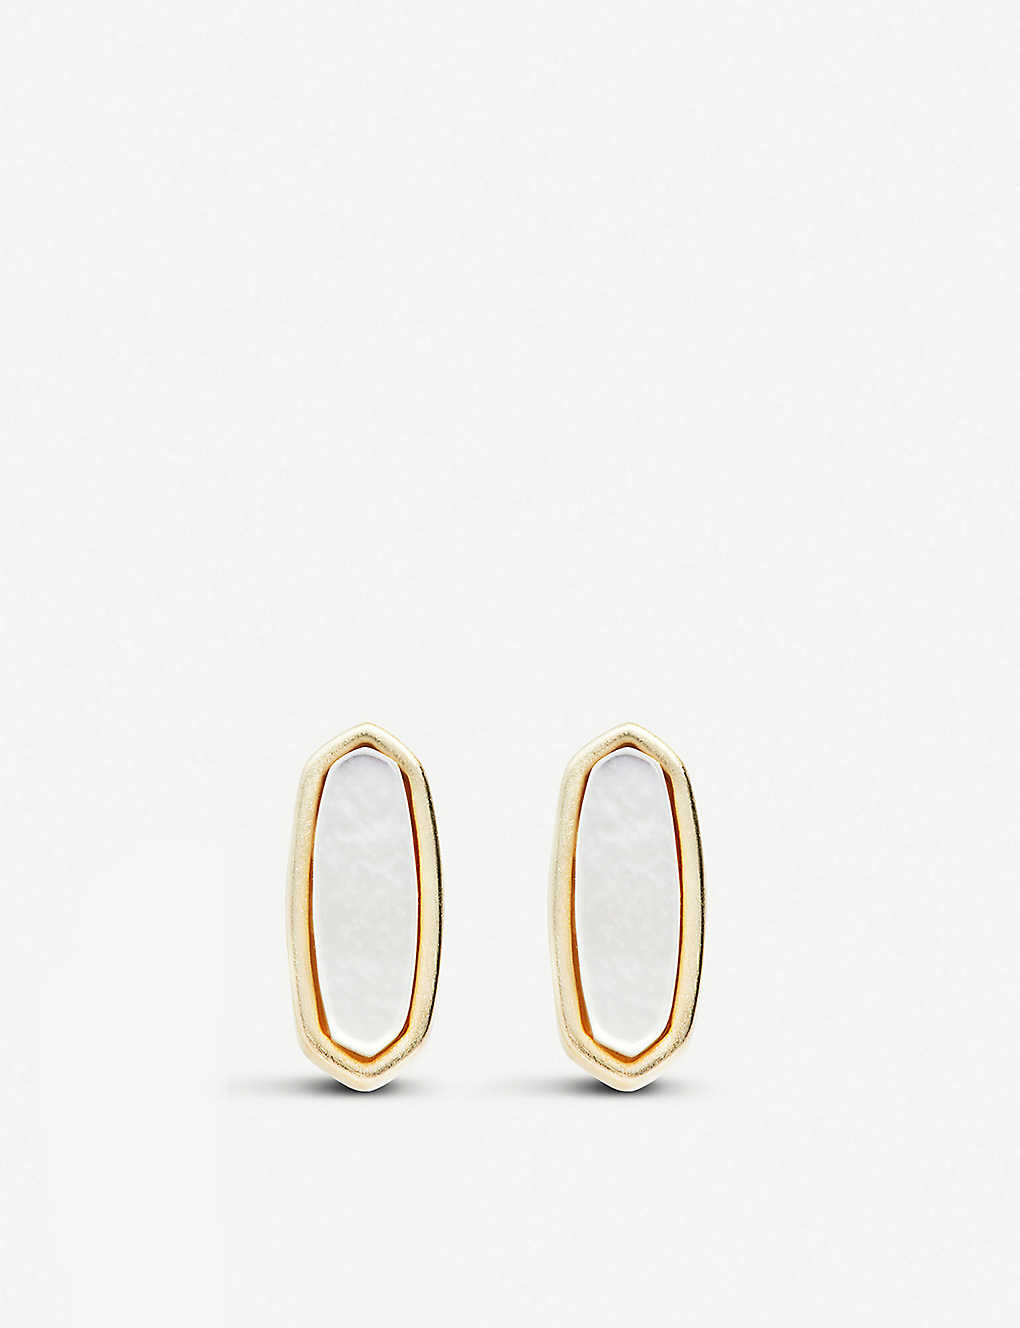 c21beb206 KENDRA SCOTT - Mae 14ct gold-plated stud earrings in ivory pearl ...